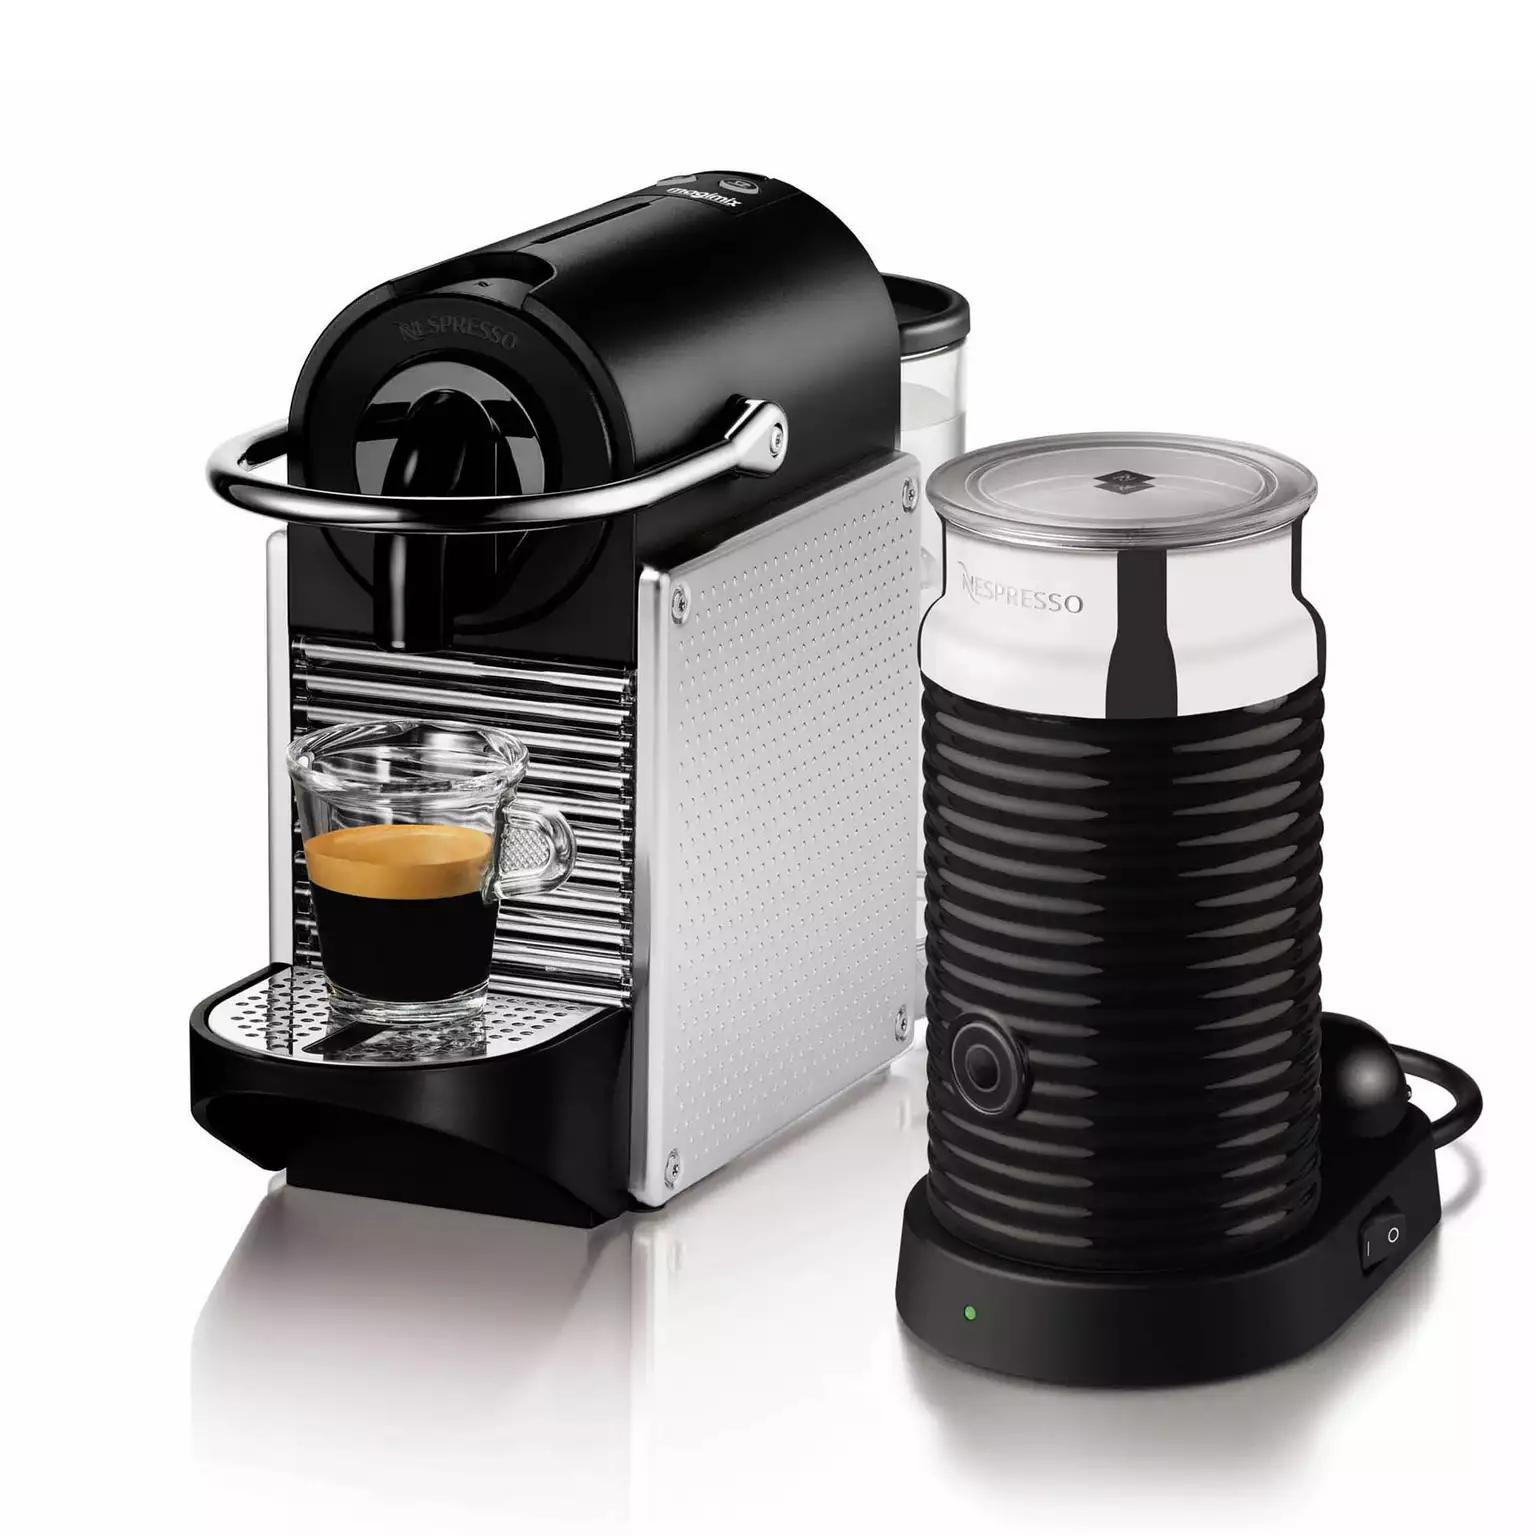 Nespresso - Aluminium 'Pixie' Aeroccino Coffee Machine By Magimix 11323 - £120 delivered @ Debenhams. Potential 10% Quidco too.